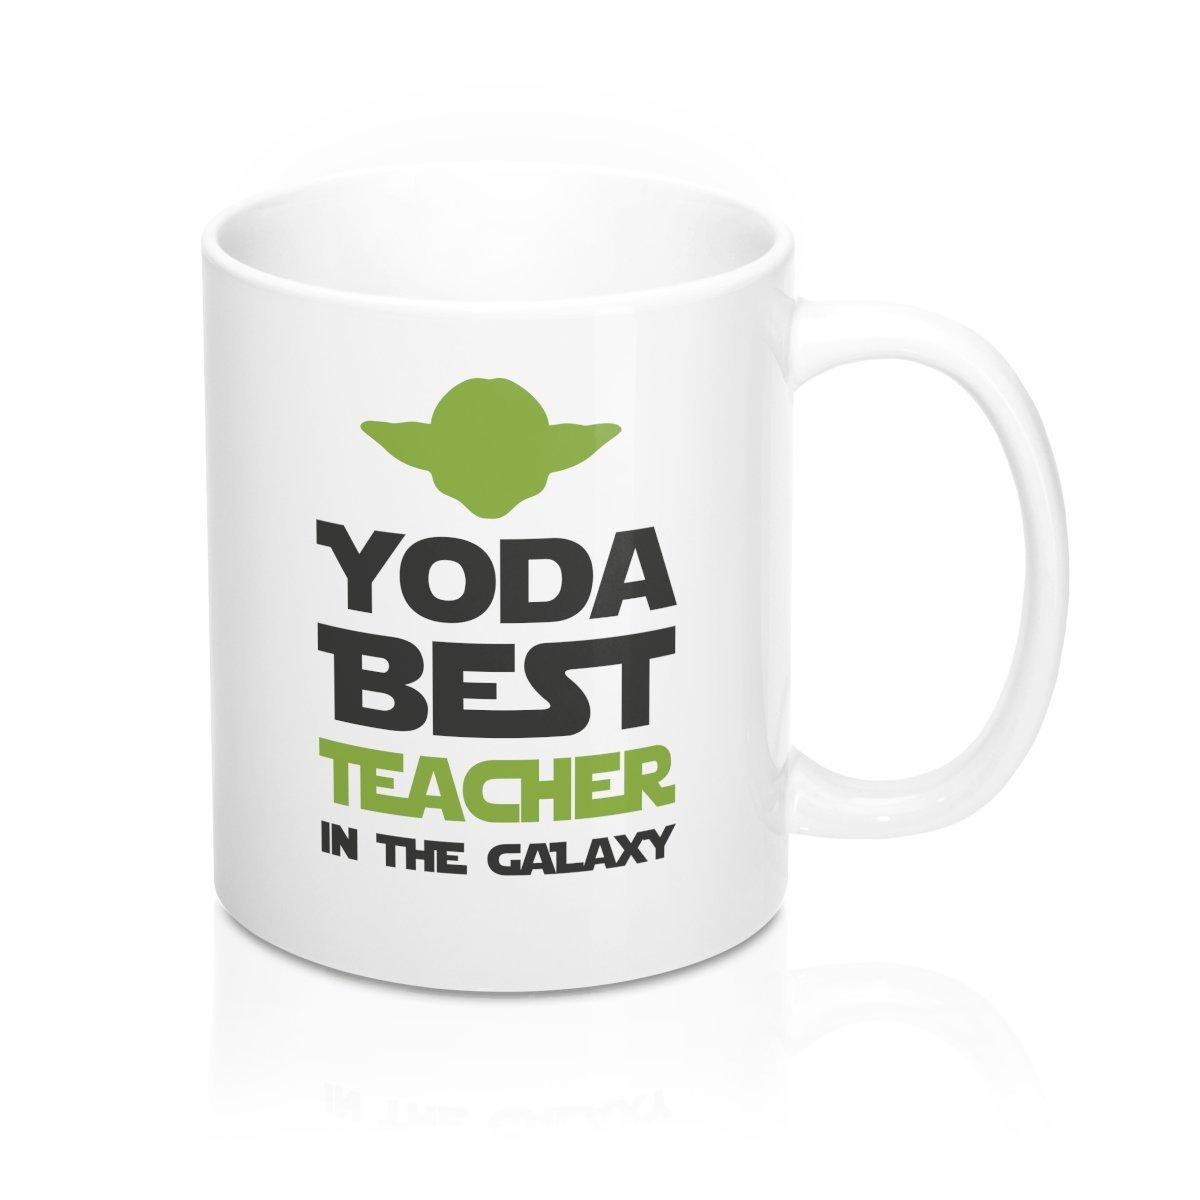 Amazon Yoda Best Teacher In The Galaxy Coffee Mug Funny Gifts